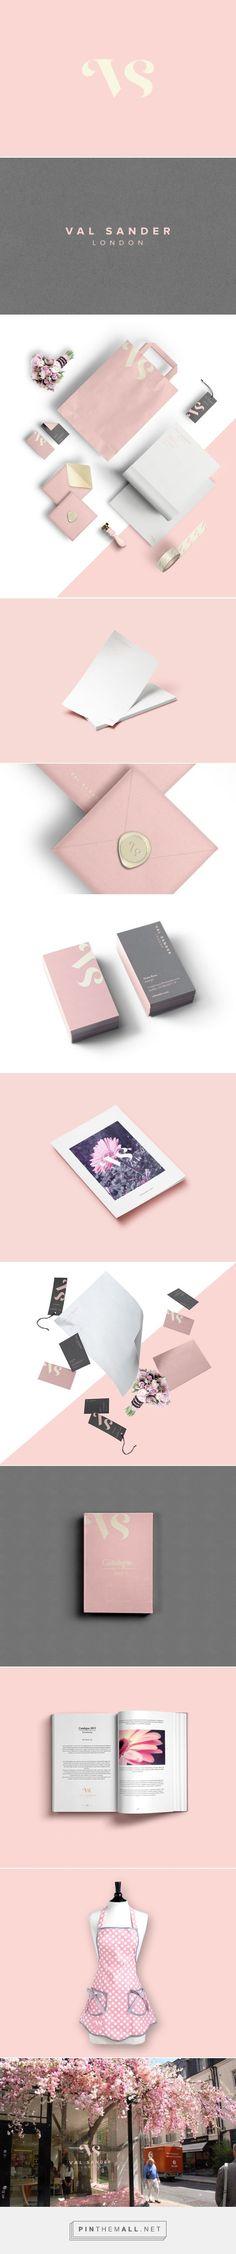 Val Sanders Flower Shop Branding (Unknown Designer) | Fivestar Branding Agency – Design and Branding Agency & Curated Inspiration Gallery